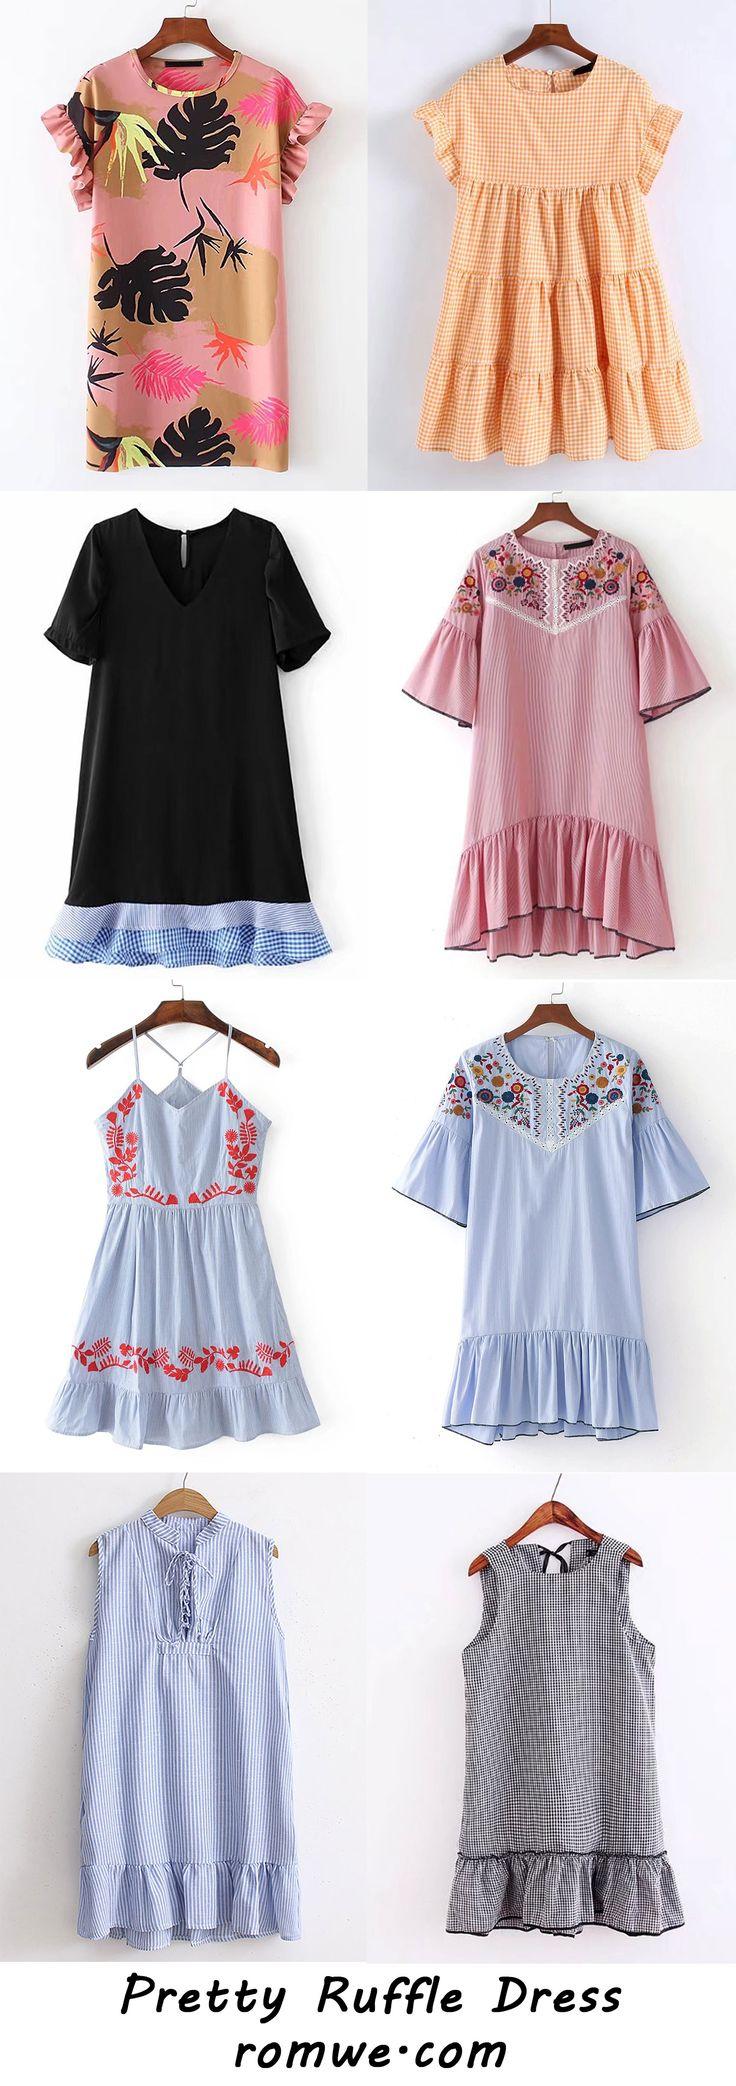 Pretty Ruffle Dresses 2017 - romwe.com